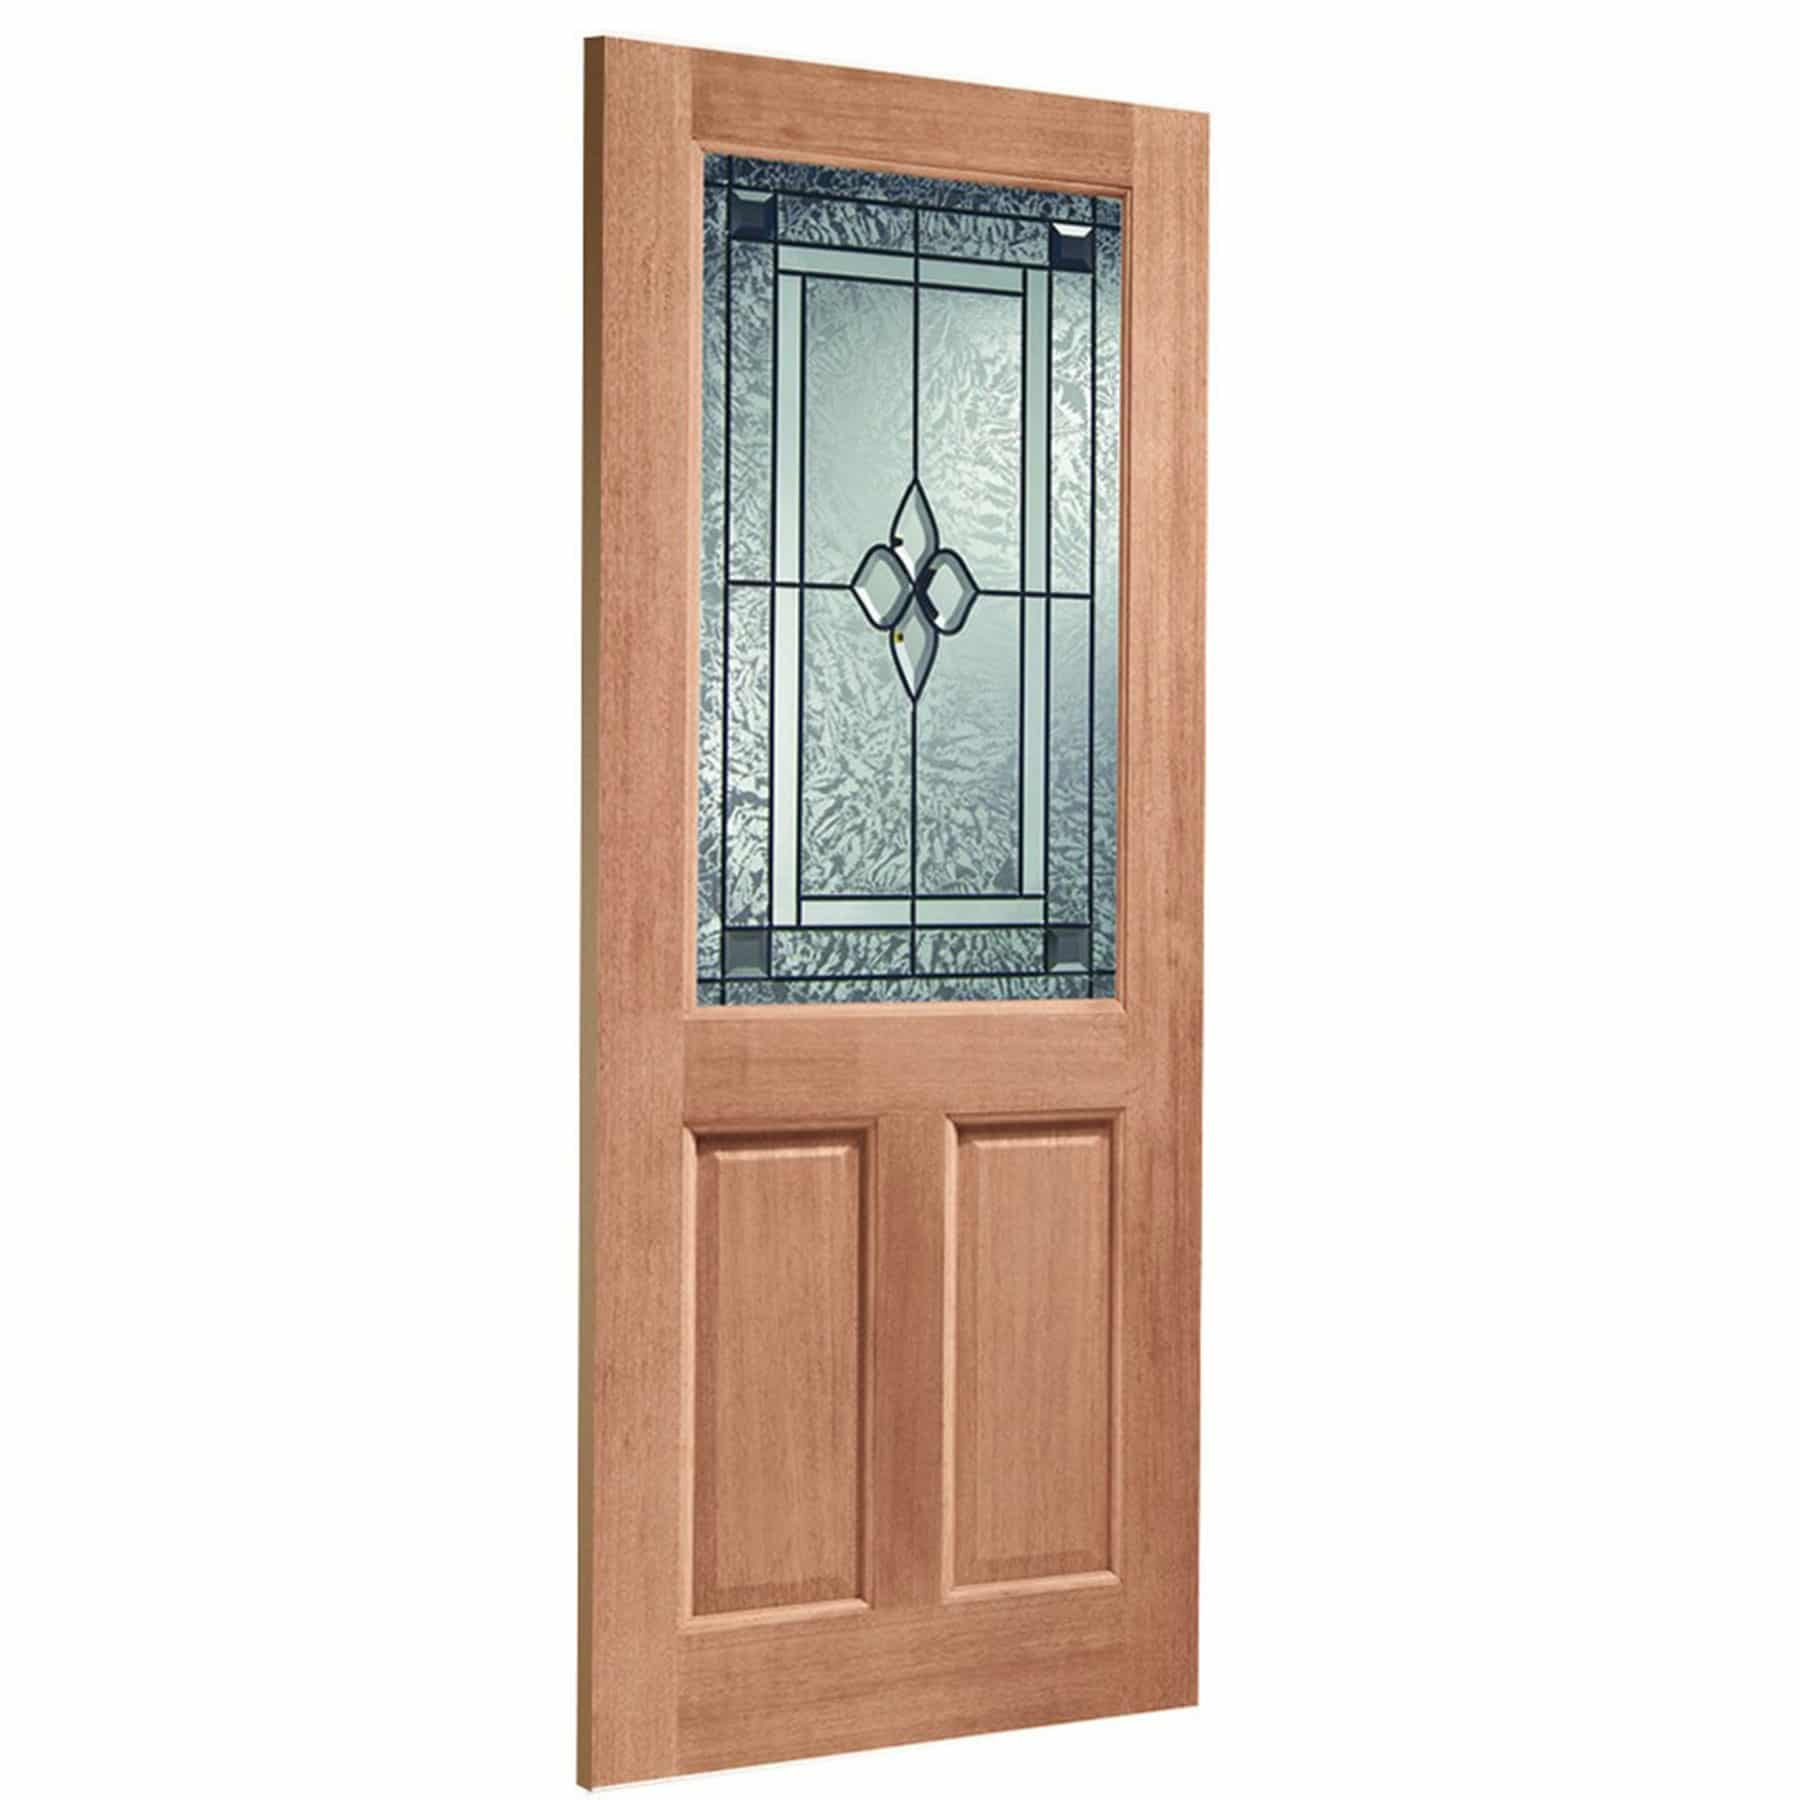 2XG Double Glazed External Hardwood Door (M&T) with Coleridge Glass